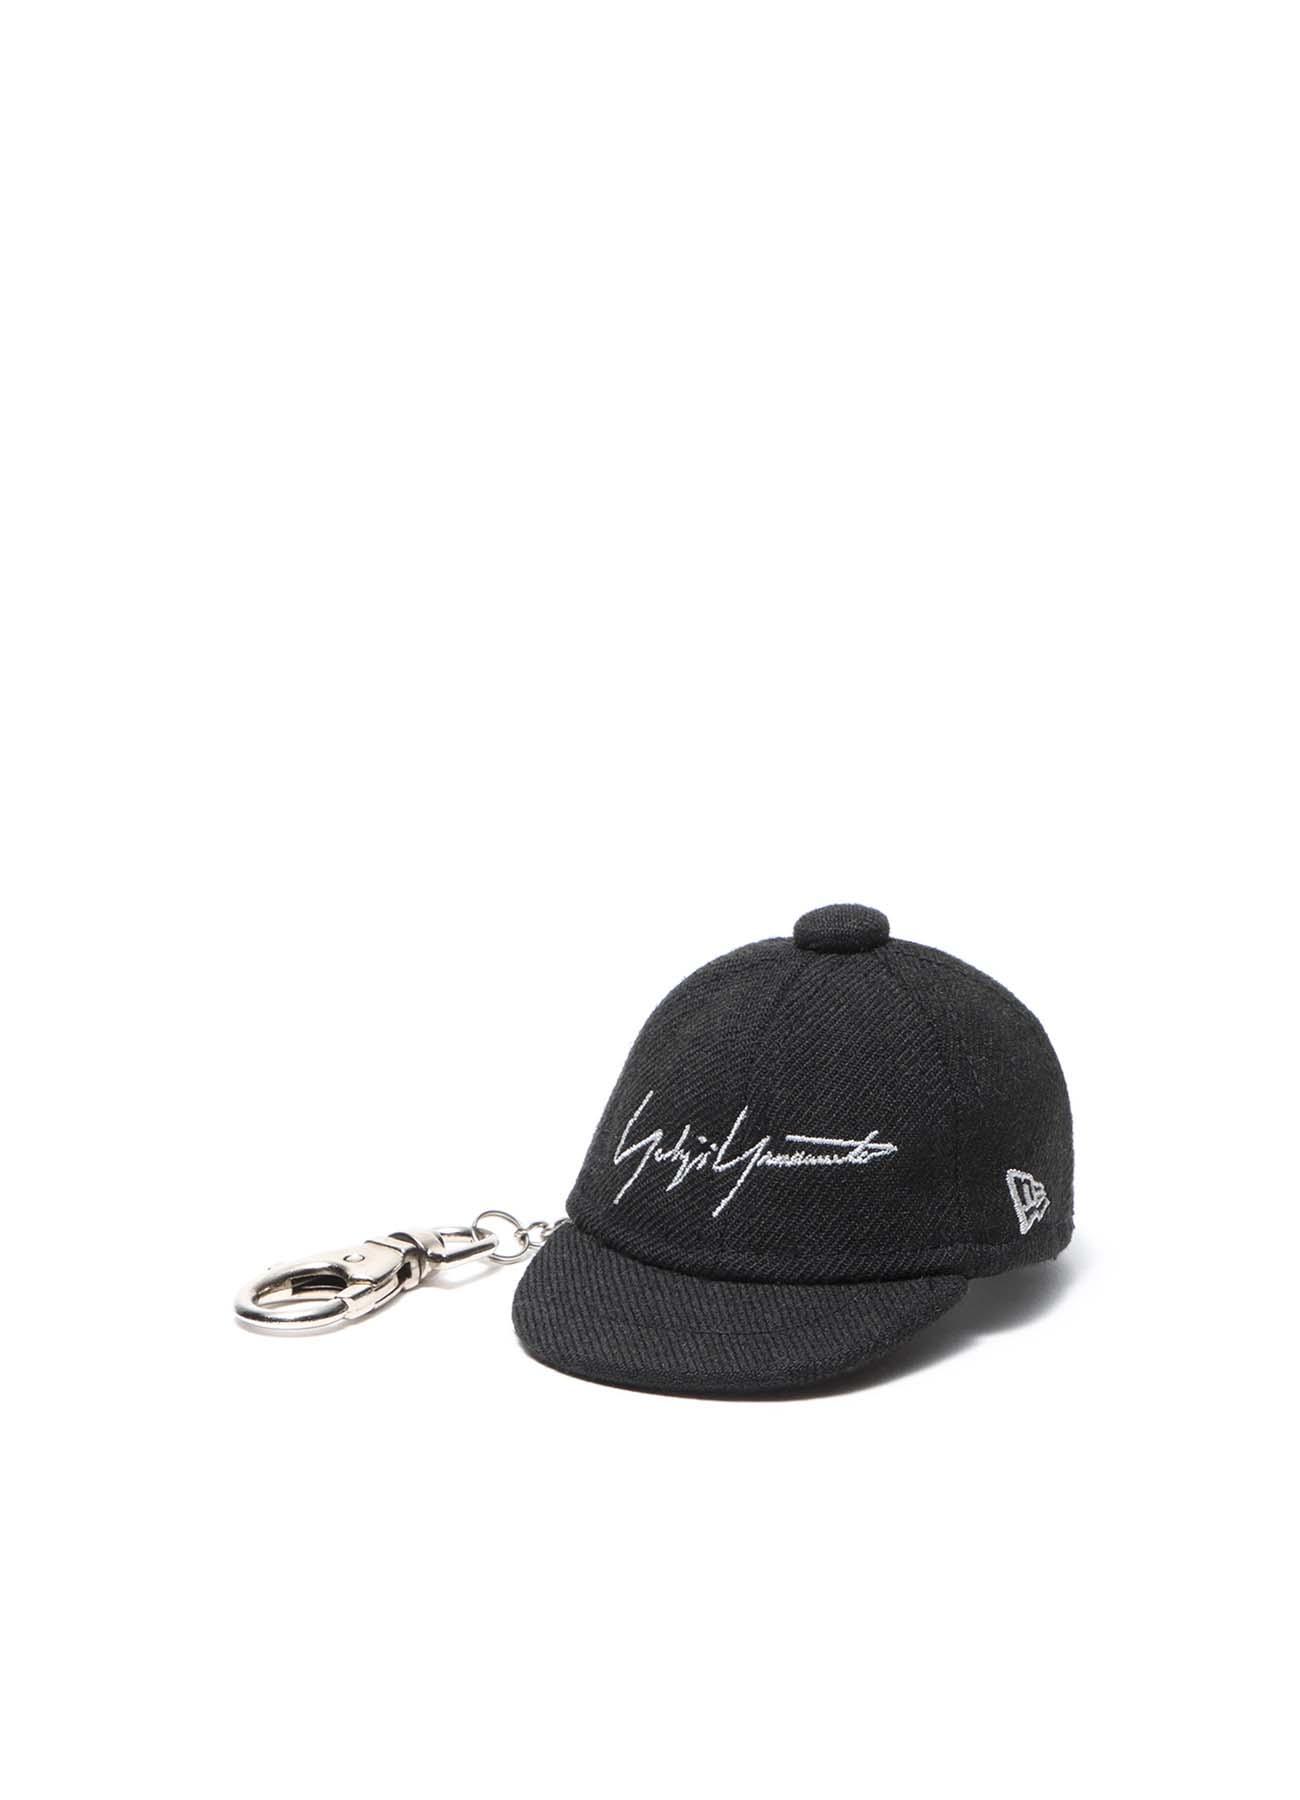 Yohji Yamamoto × New Era BLACK SERGE CAP KEYHOLDER BLACK/GRAY